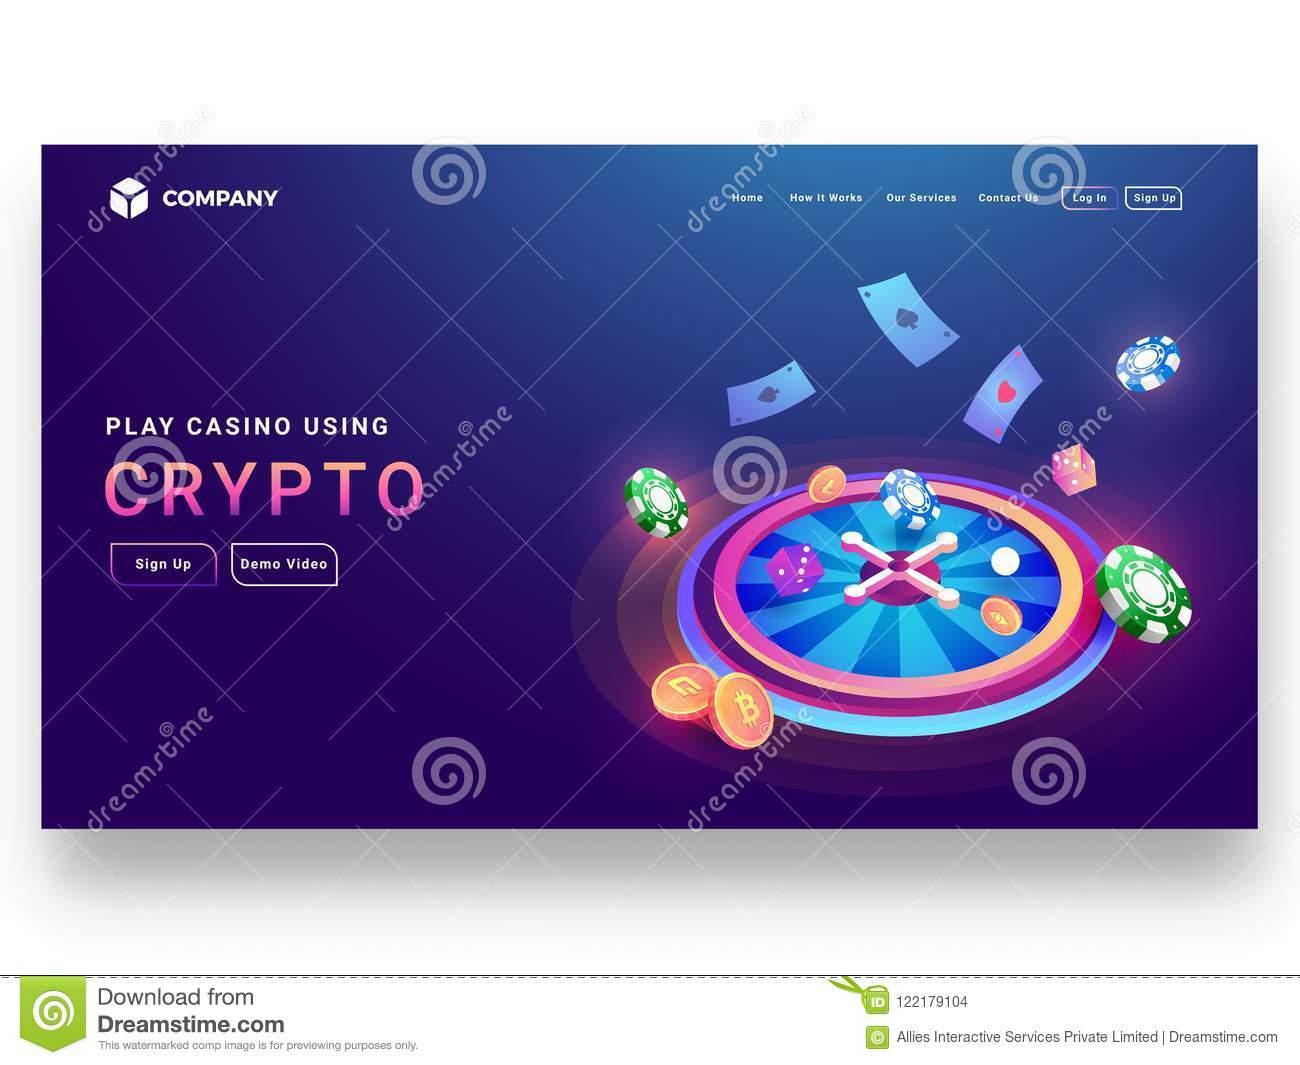 Hacking online casino games